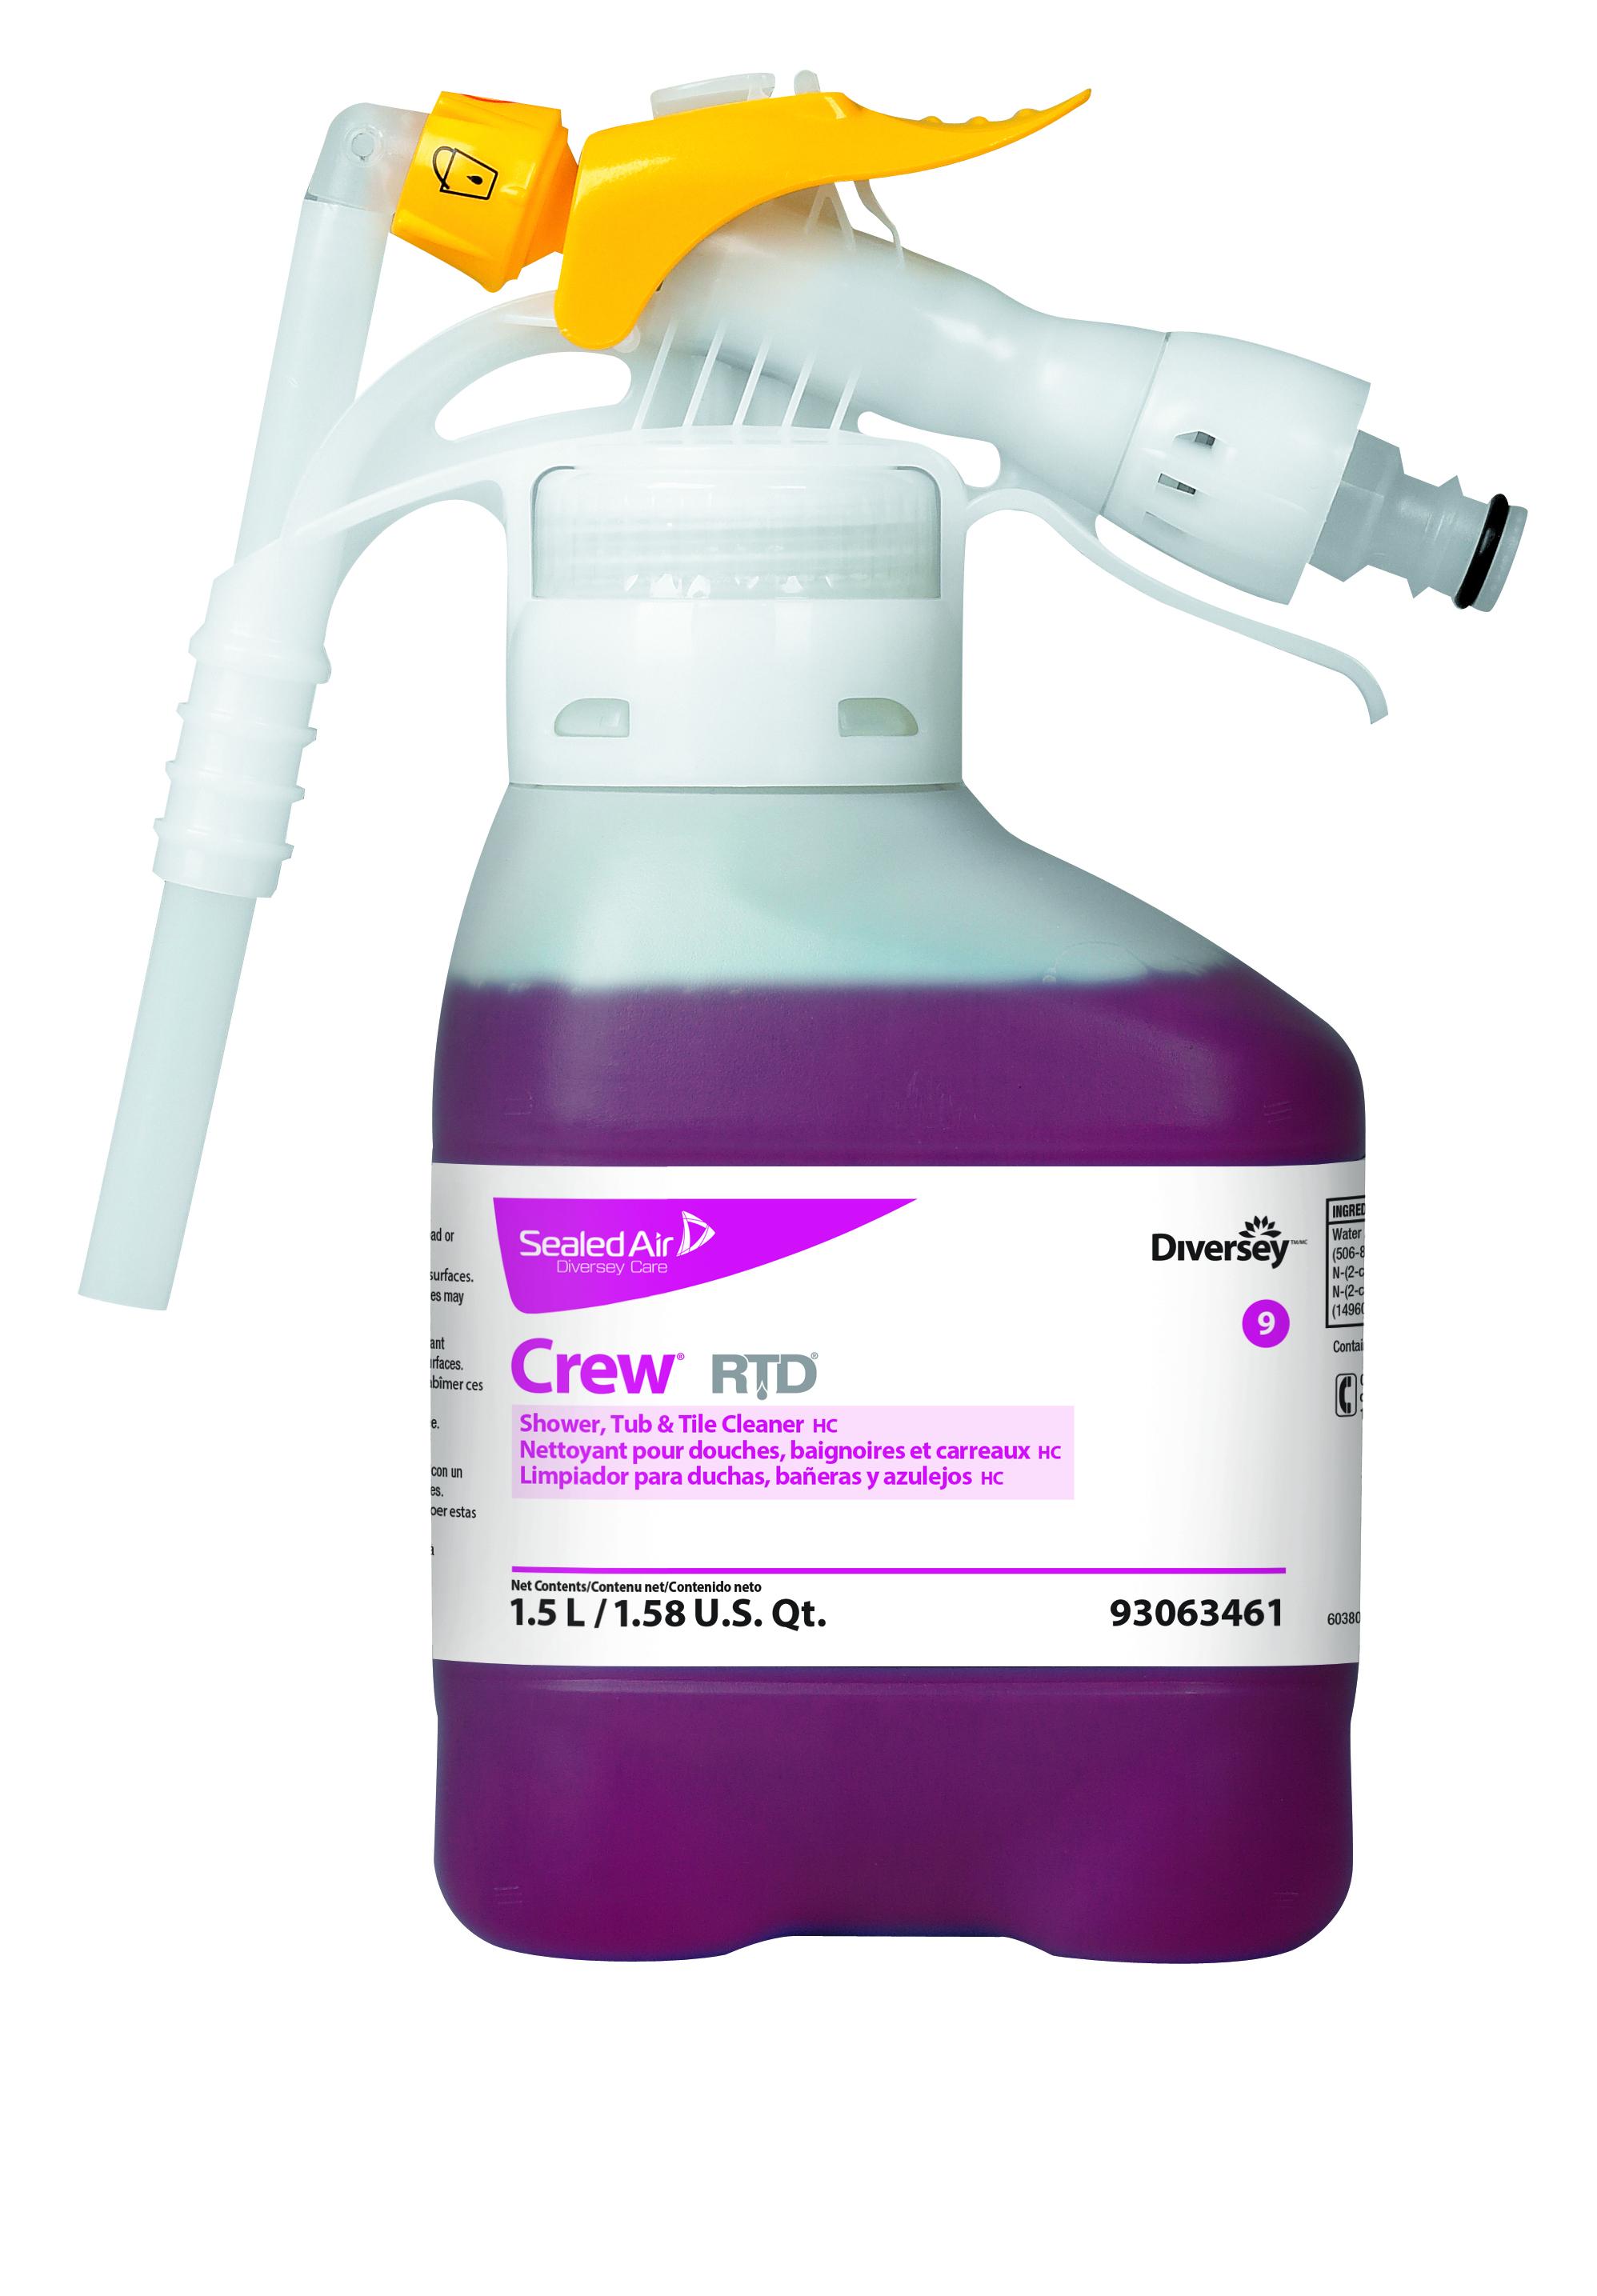 Crew® Shower, Tub & Tile Cleaner | Diversey